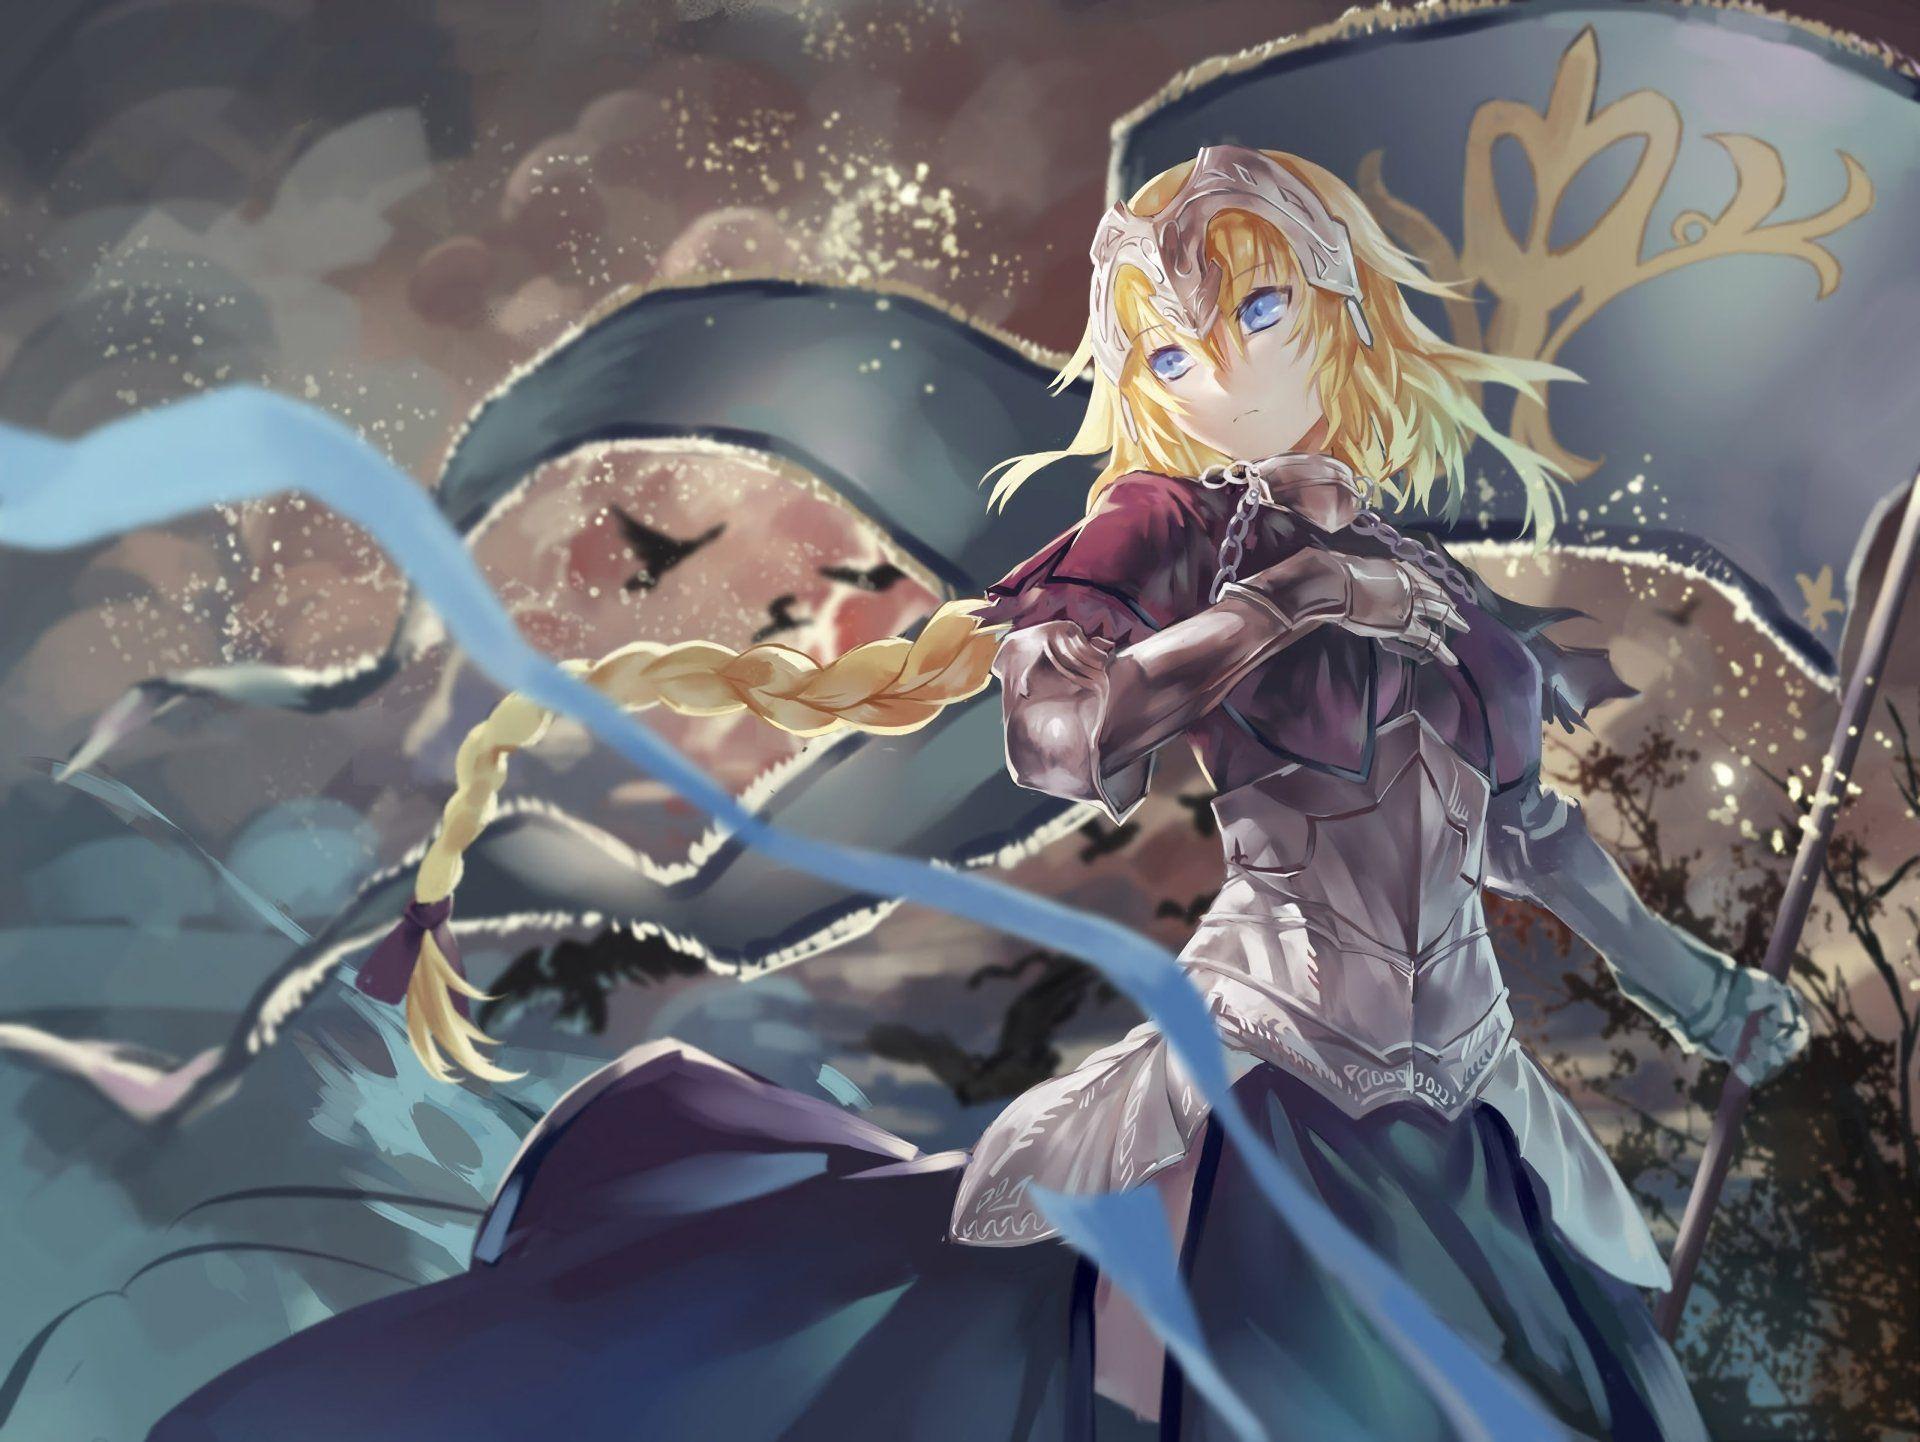 Anime Fate Apocrypha Ruler Armor Girl Blonde Long Hair Braid Woman Warrior Blue Eyes Banner Grand Order Jeanne DArc Wallpaper